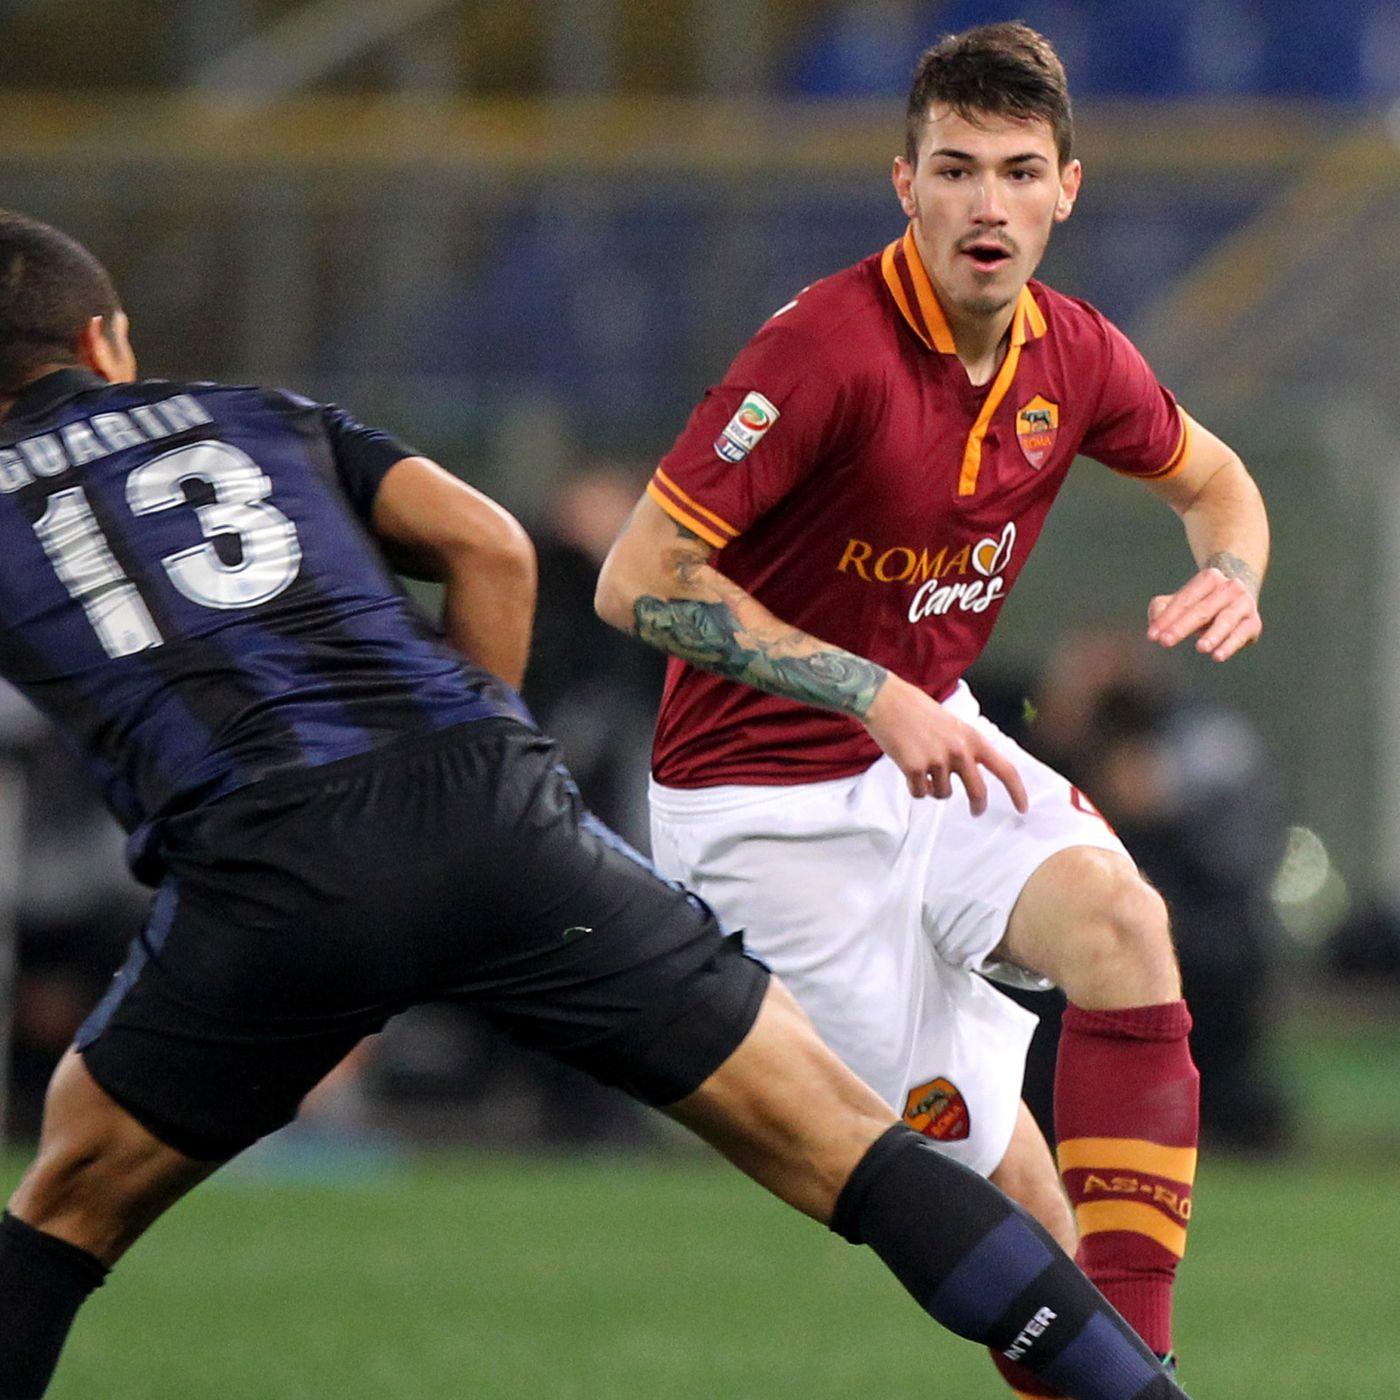 Alessio Romagnoli The Fullback: An Analysis - Chiesa Di Totti